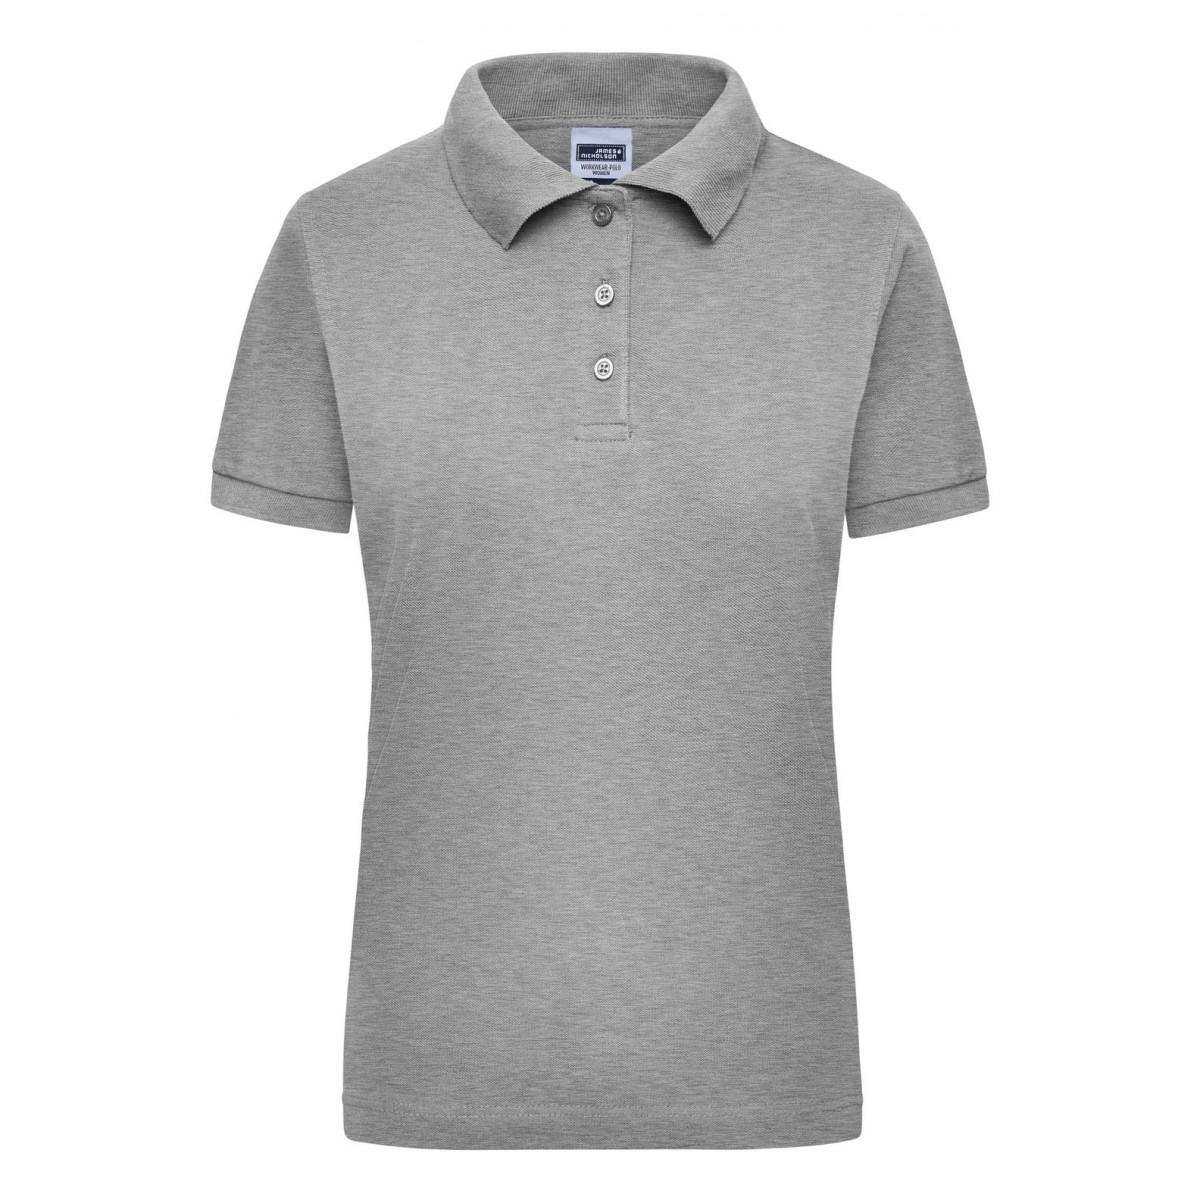 Рубашка поло мужская JN803 Workwear Polo Women - Серый меланж